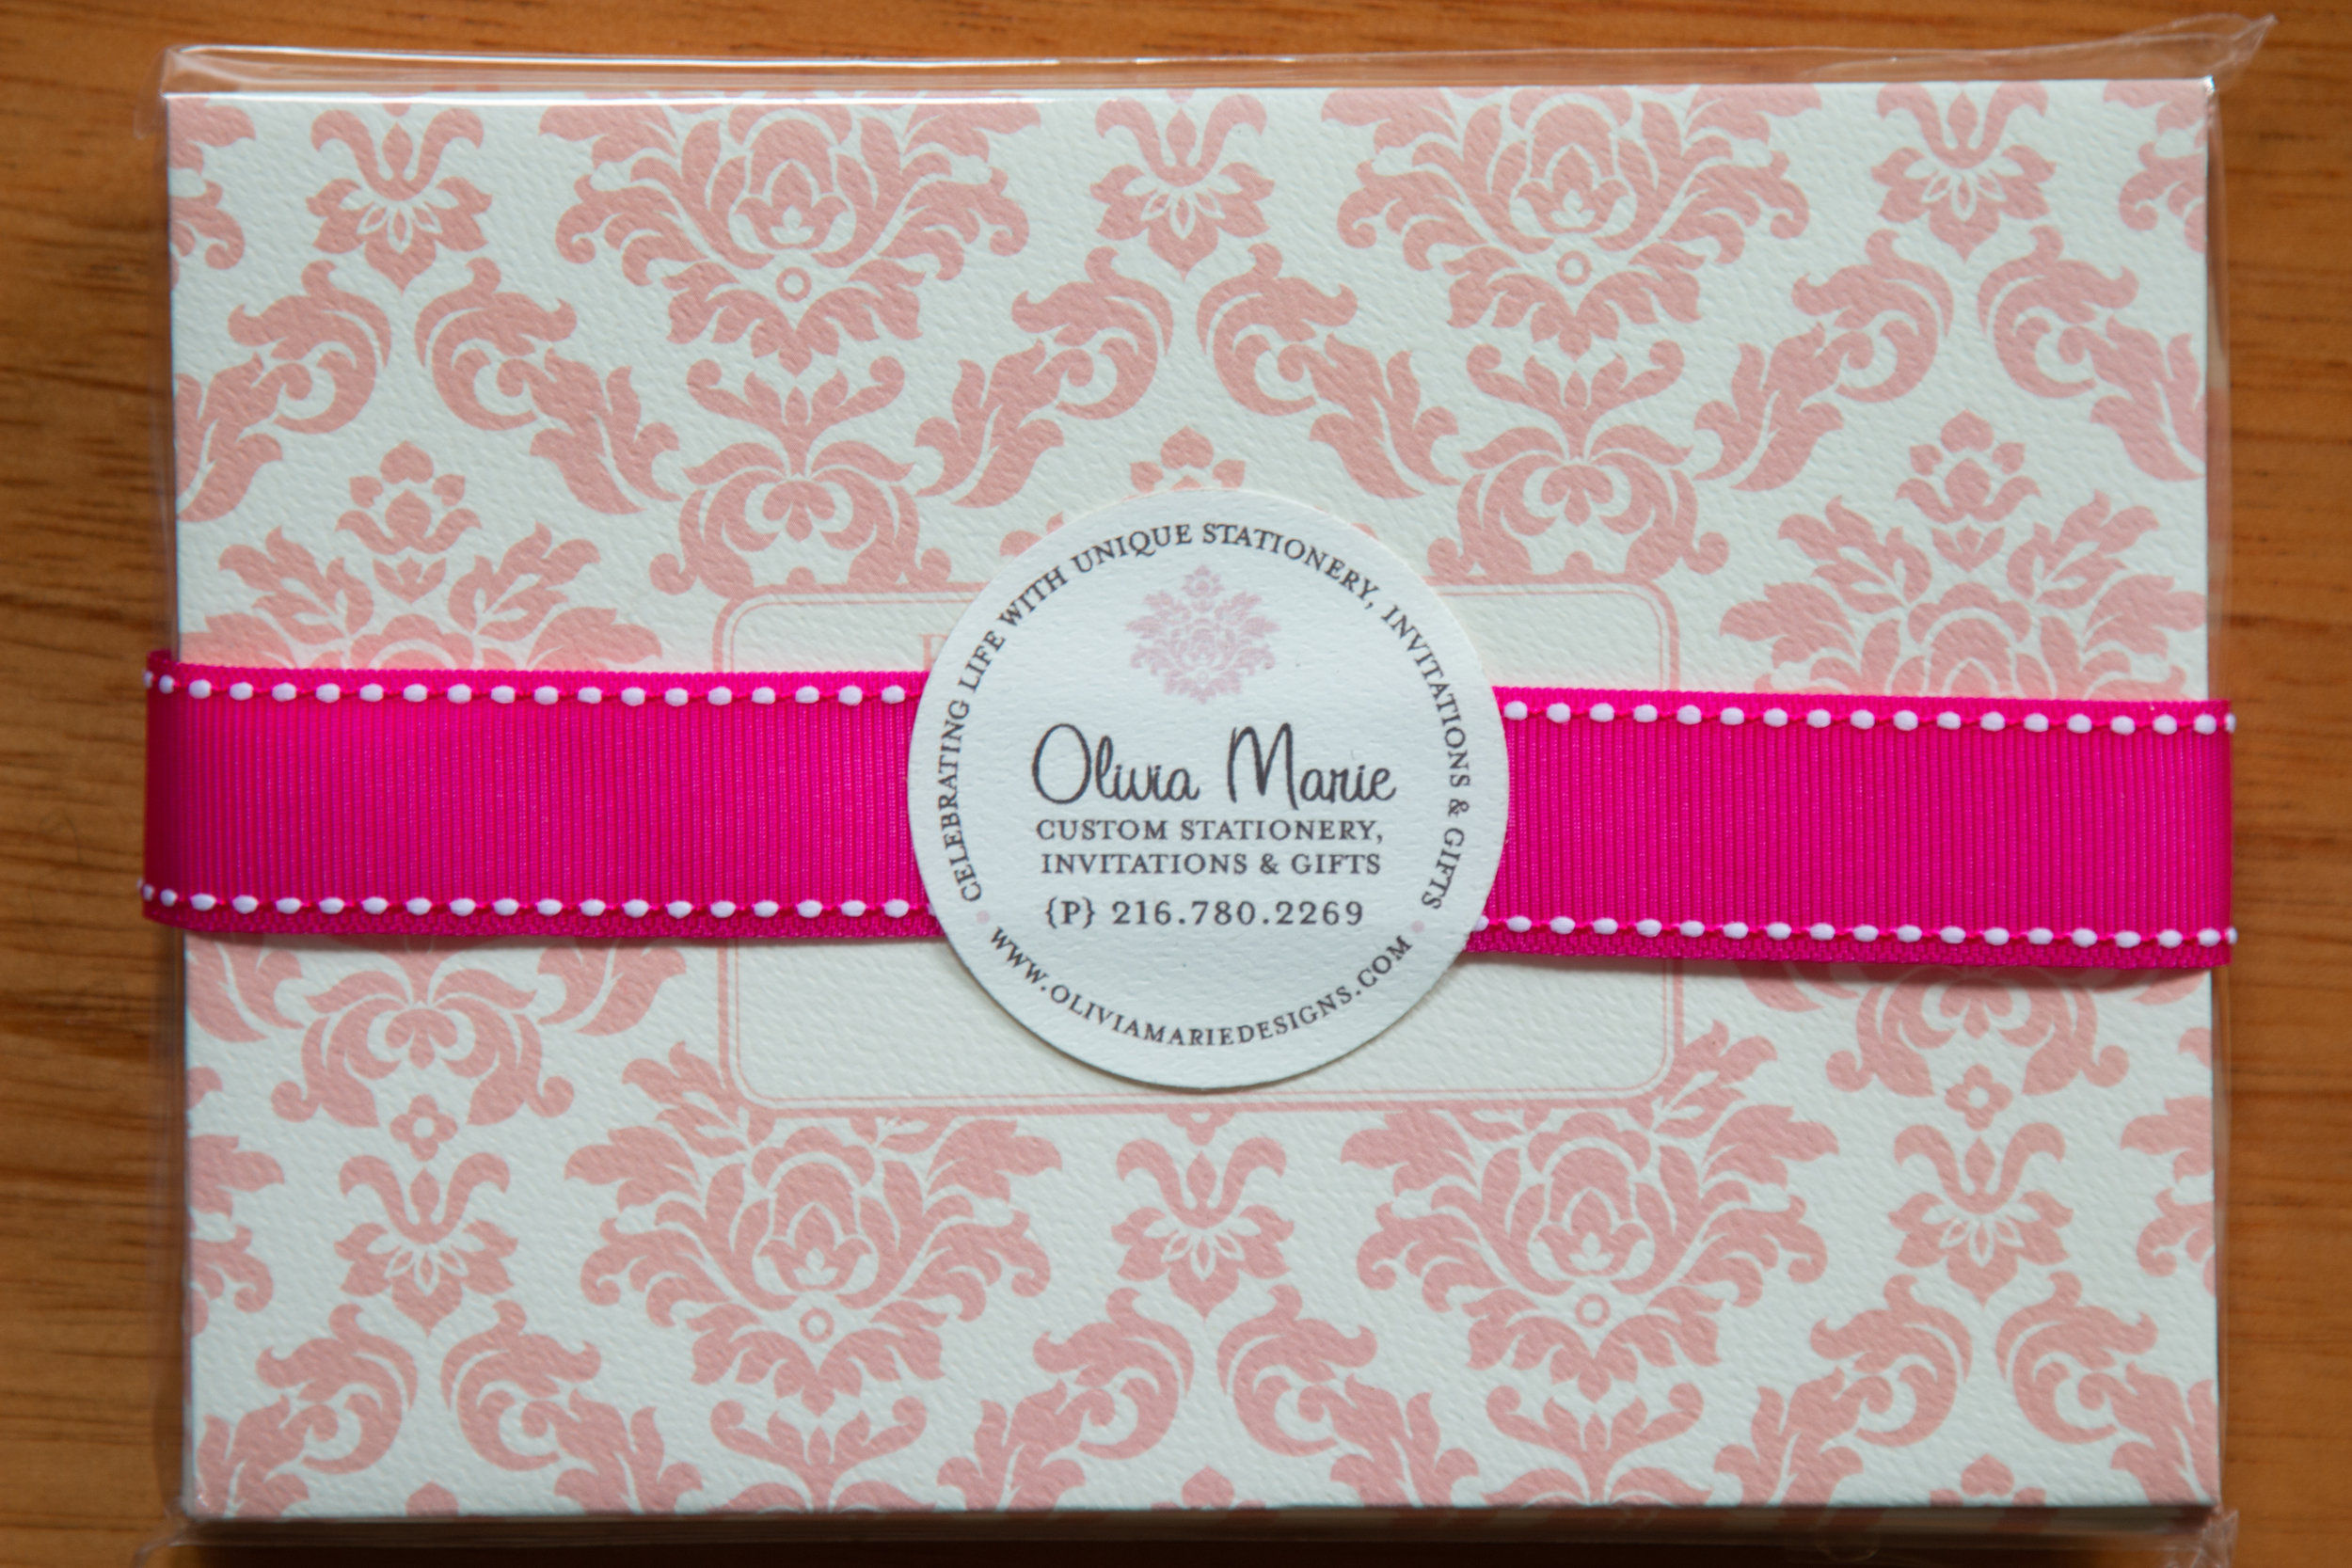 Olivia Pink Stationery Set $20